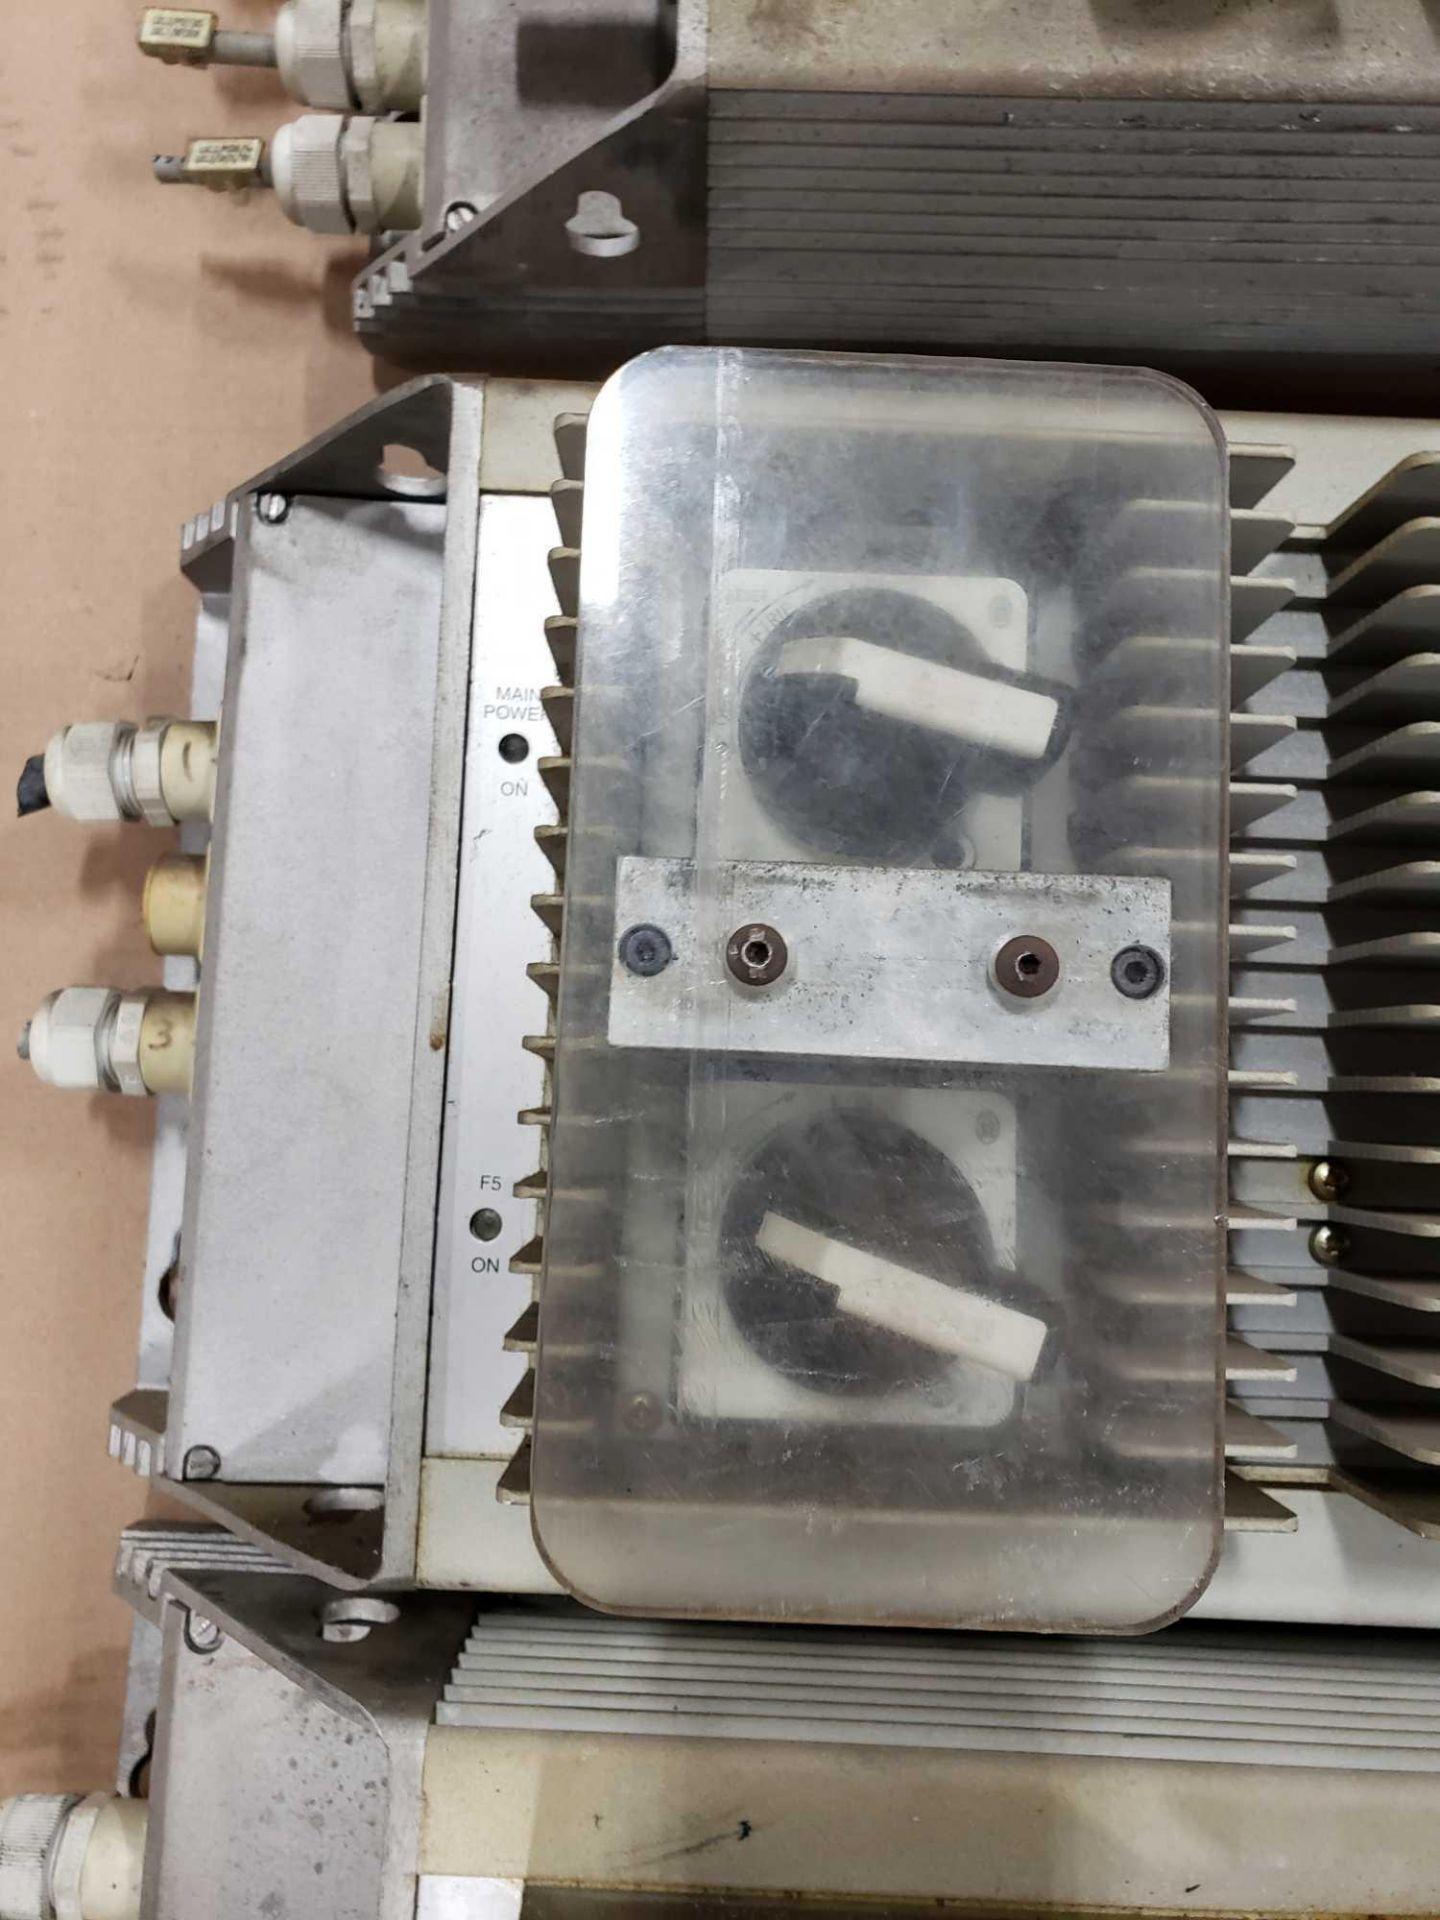 Lot 374 - Phoenix Contact Interbus Type IBS-IP-500-PS-2-BS power supply.